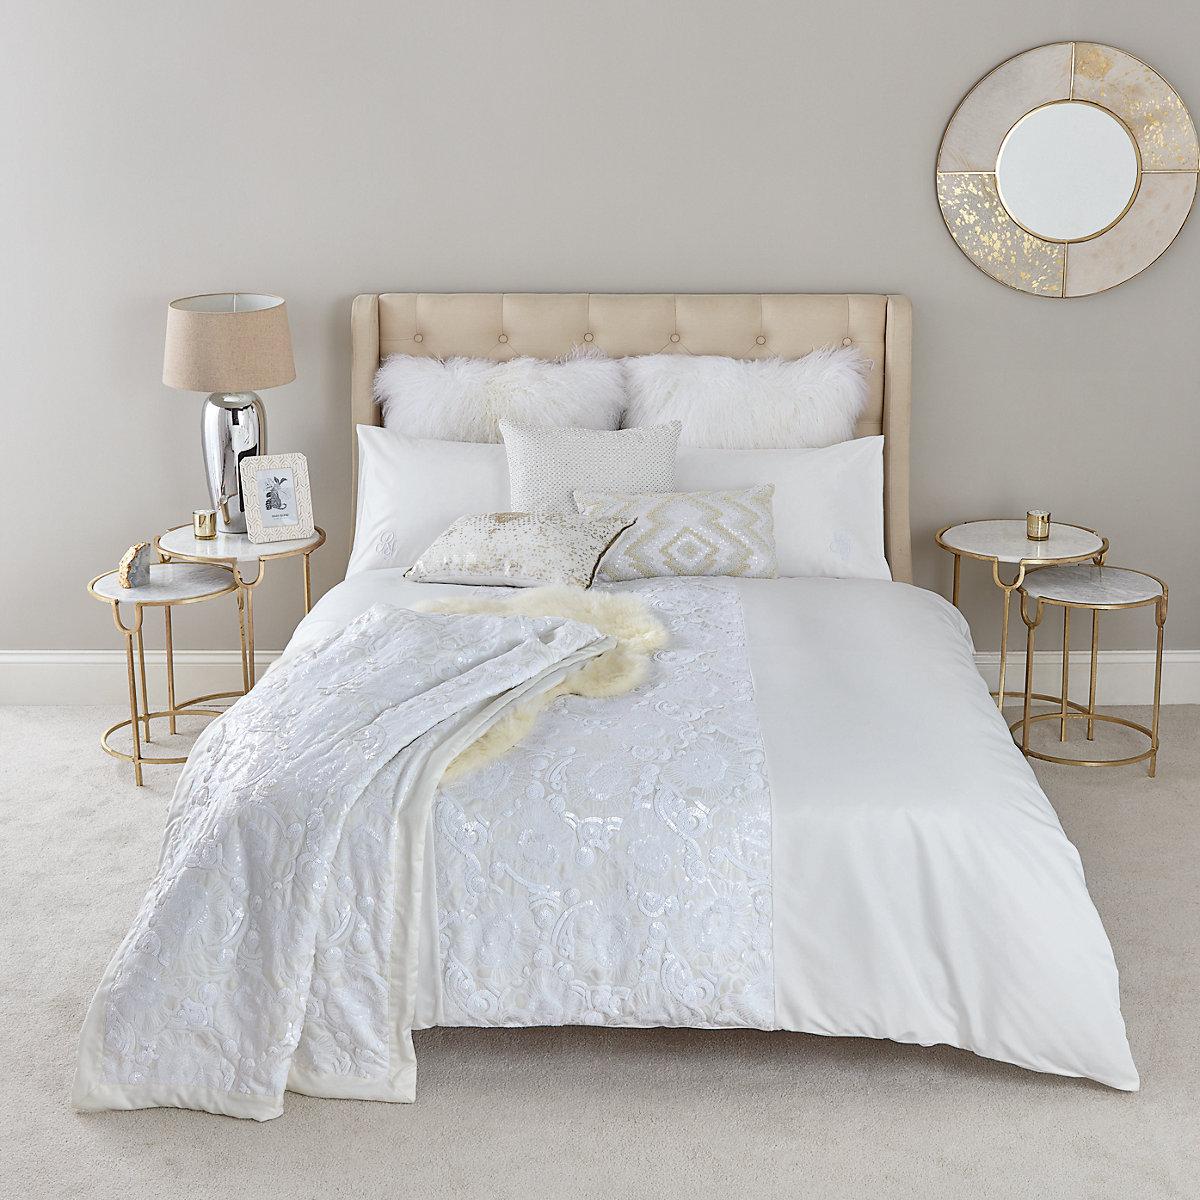 Cream white sequin double duvet bed set